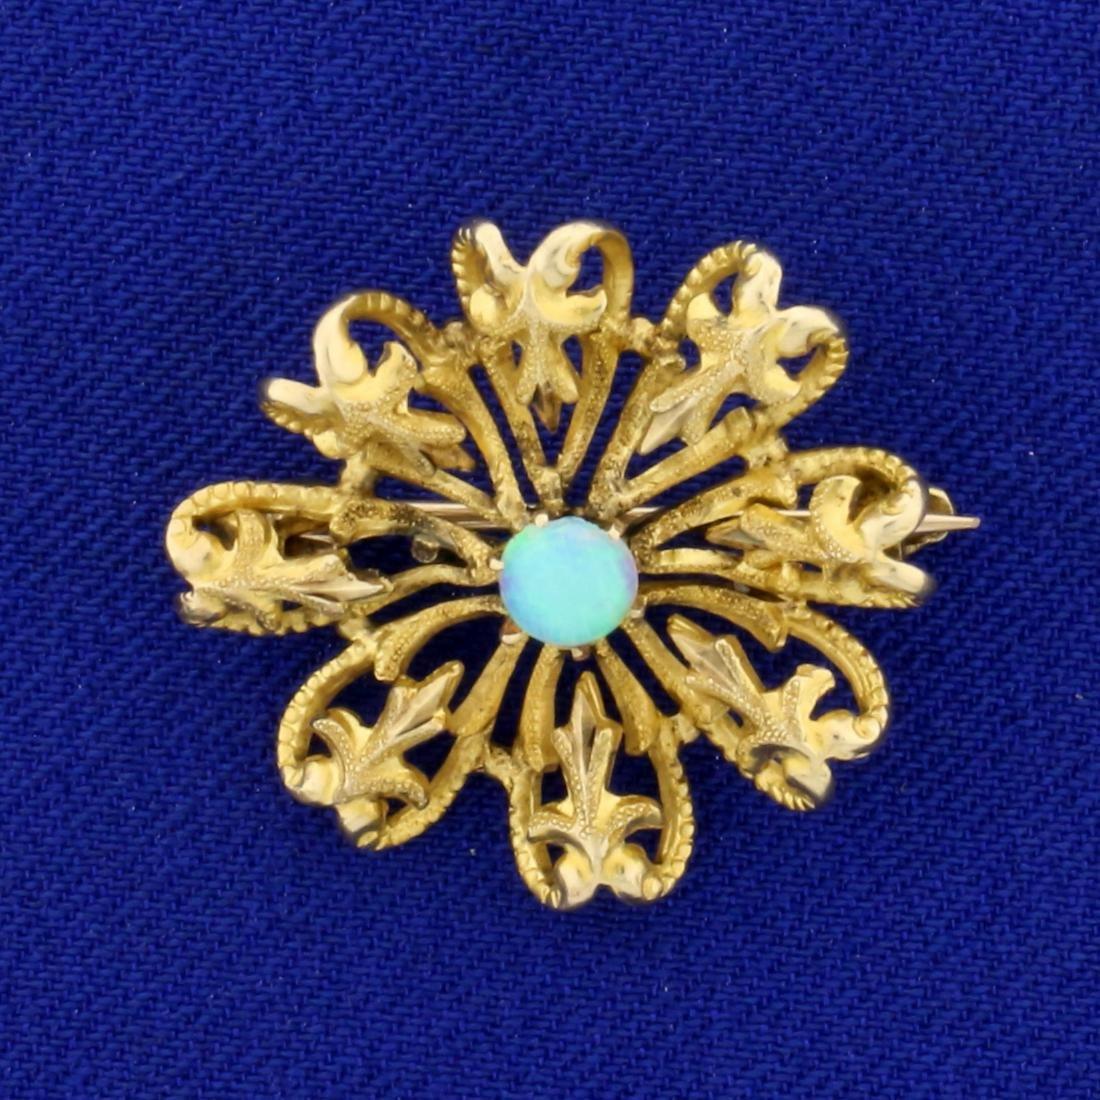 Vintage Fleur de Lis Design Opal Pin in 14K Yellow Gold